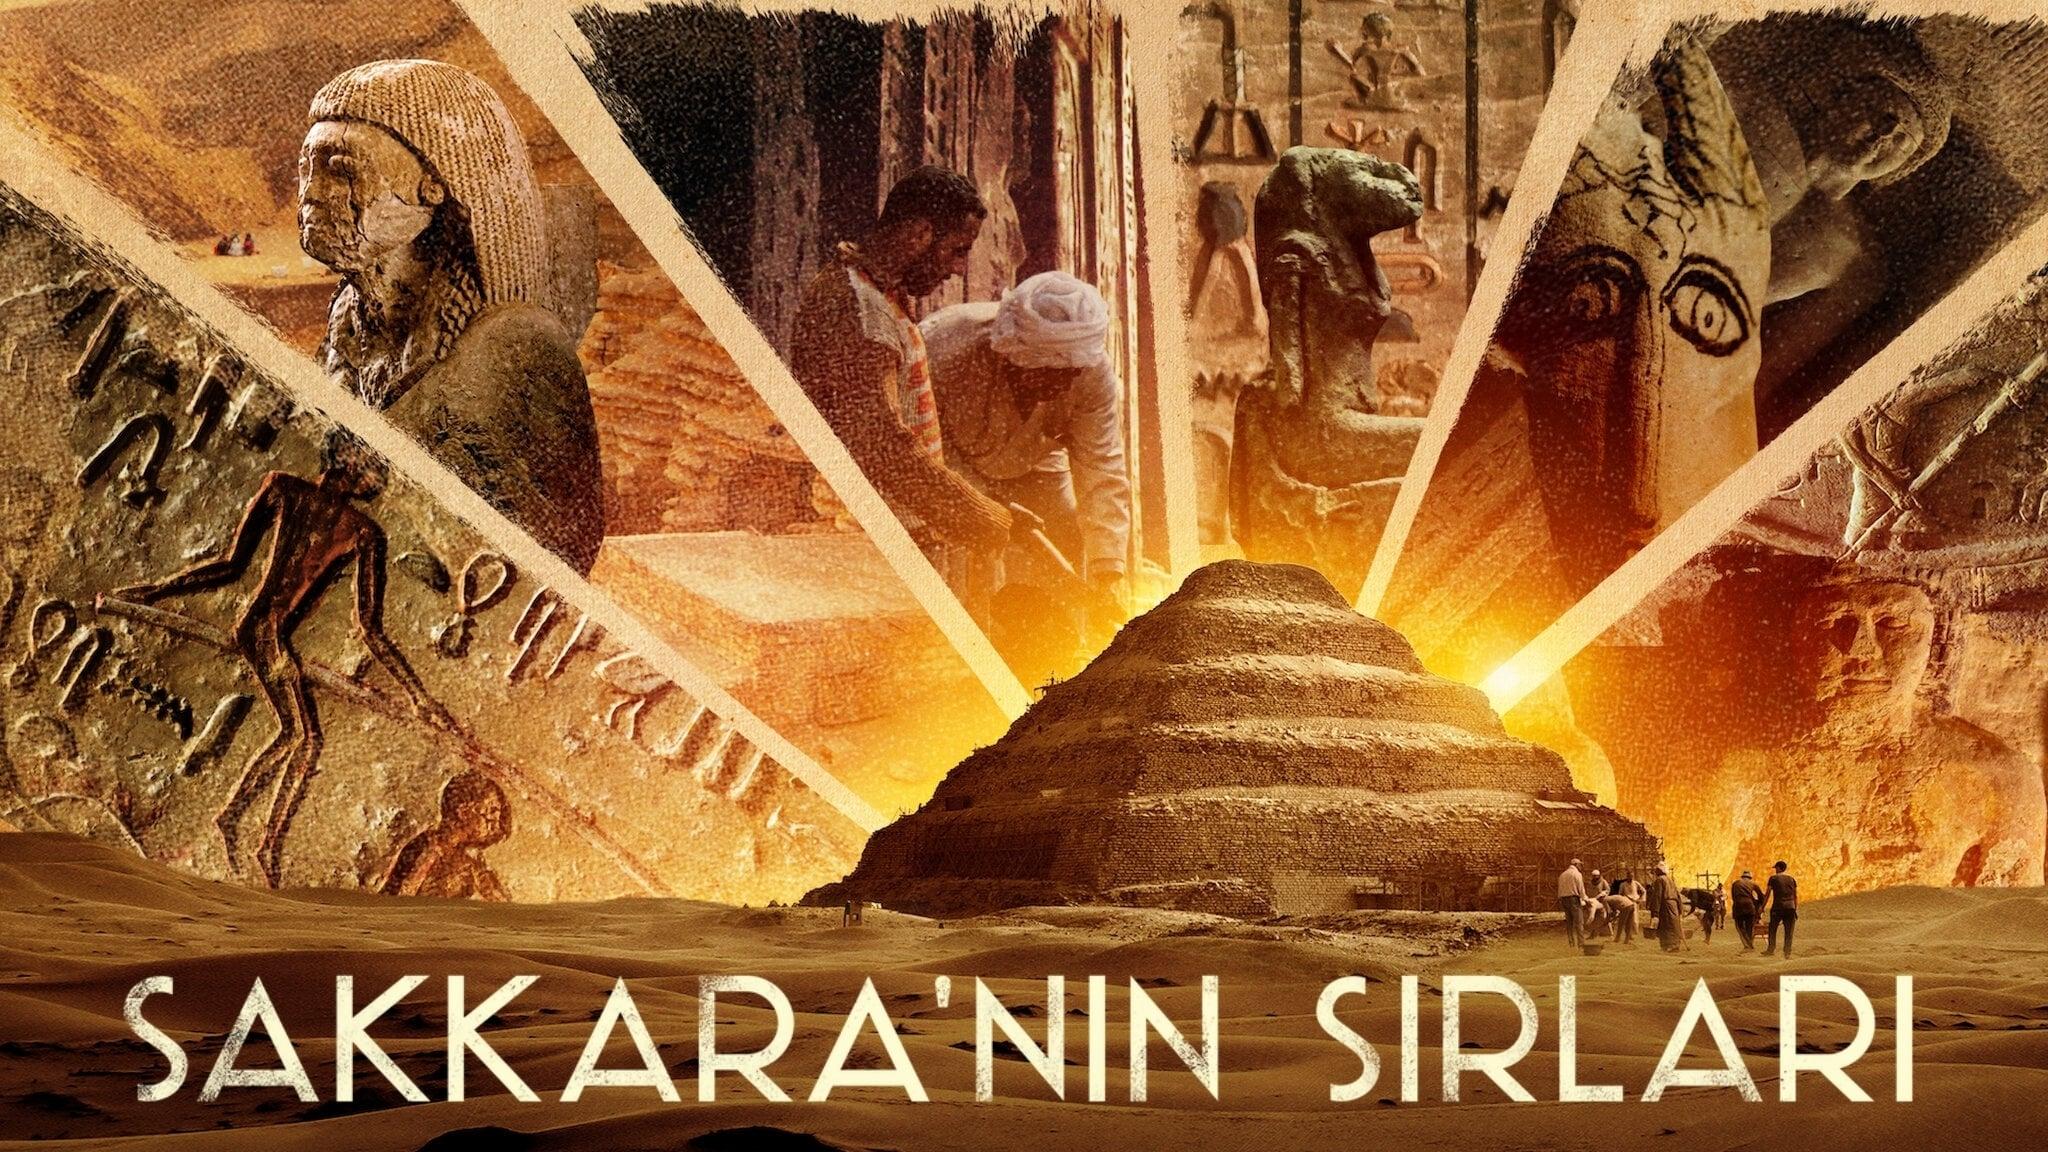 Los secretos de la tumba de Saqqara